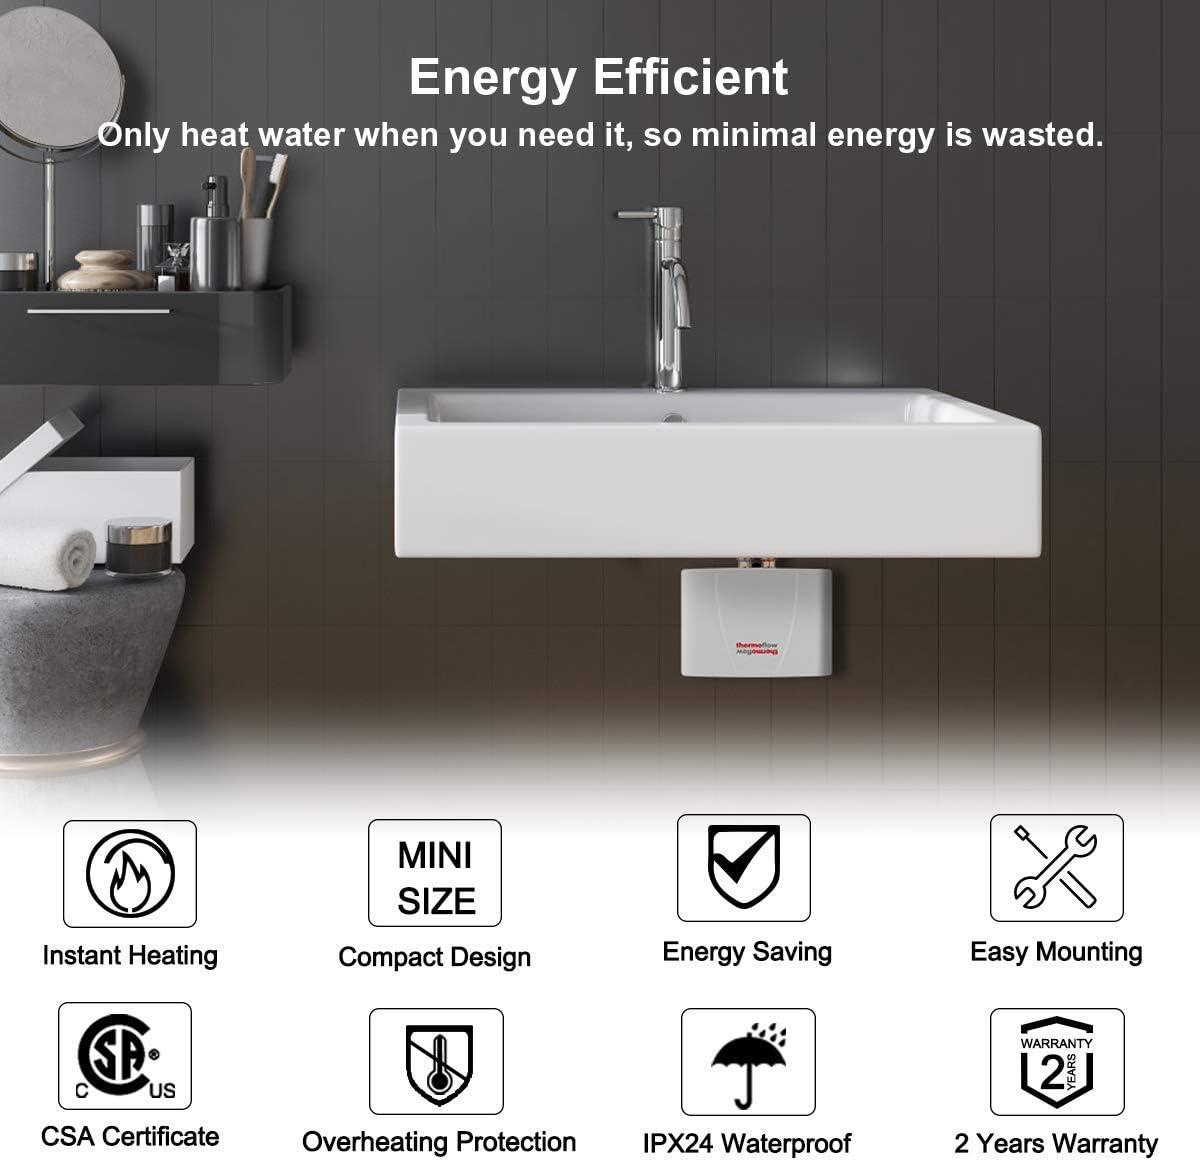 Ymiko Mini Calentador de Agua el/éctrico para el hogar Calentador de Agua instant/áneo sin Tanque M/áquina de calefacci/ón Cocina Accesorios de ba/ño 220V EU Plug-Negro